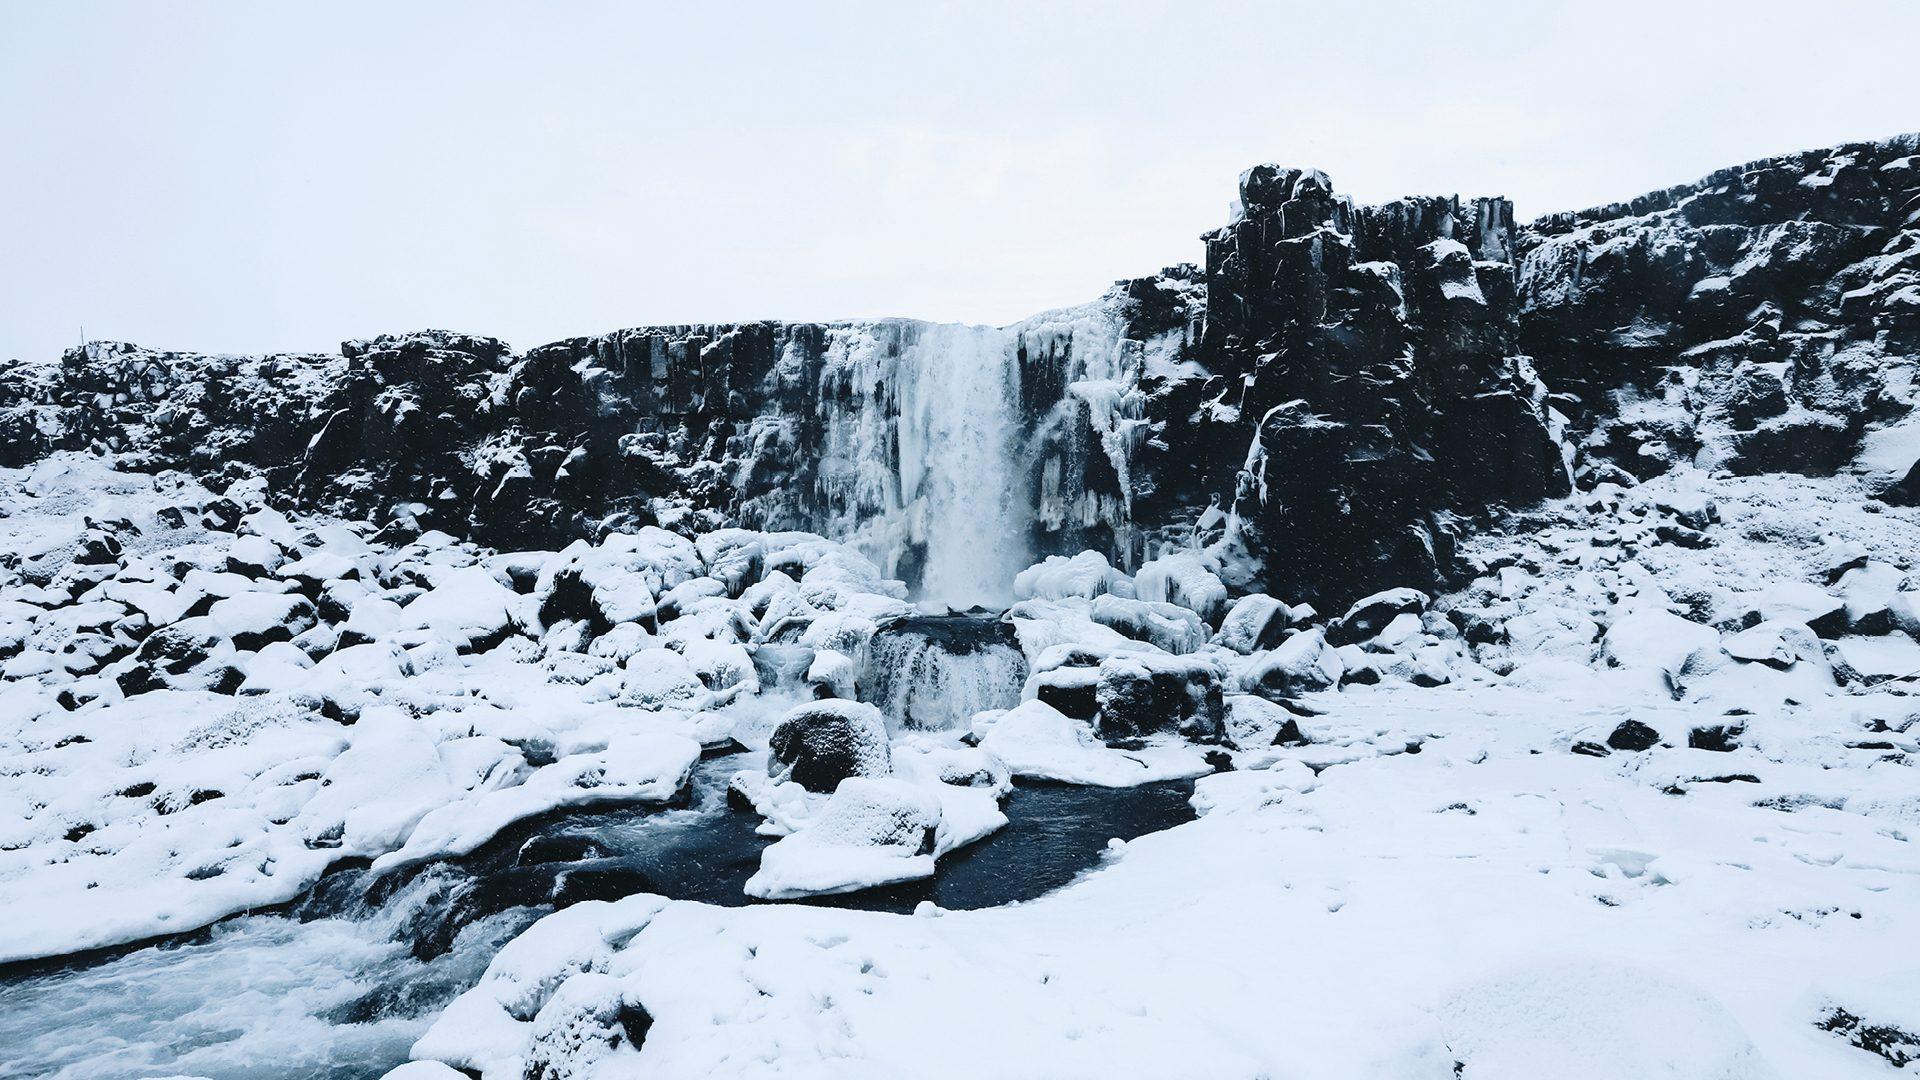 ijsland-in-de-sneeuw